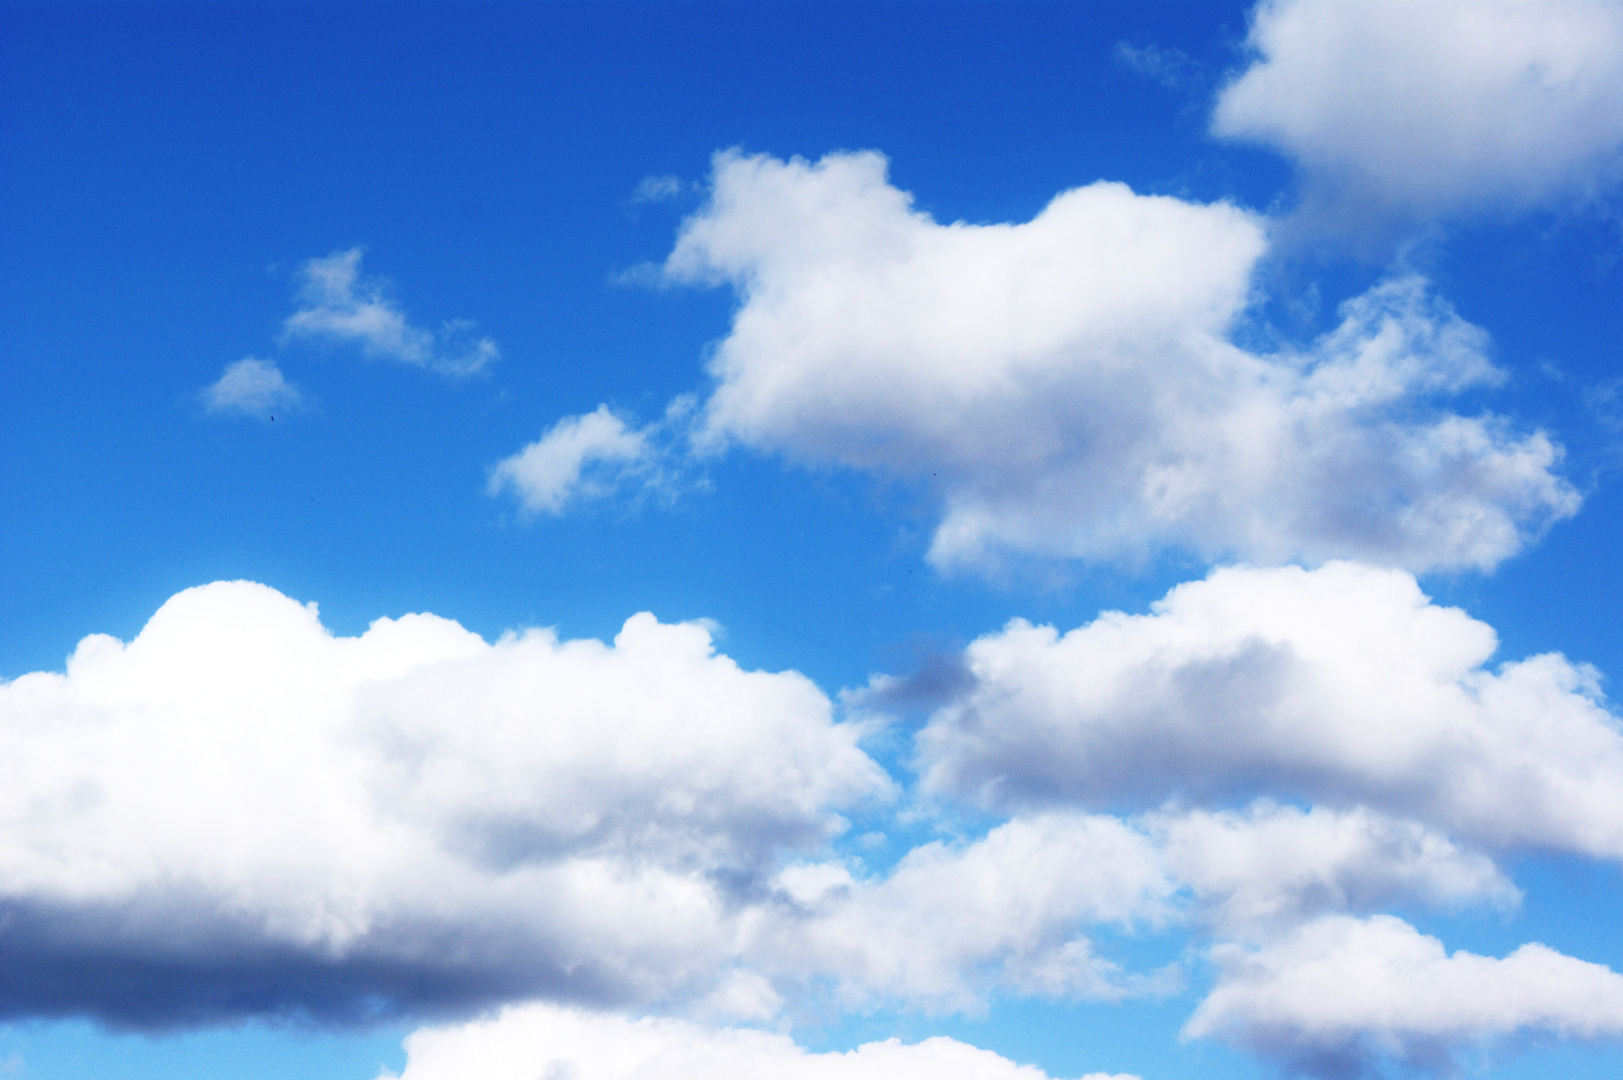 Wolken Foto & Bild | himmel, wolken, himmel & universum ...